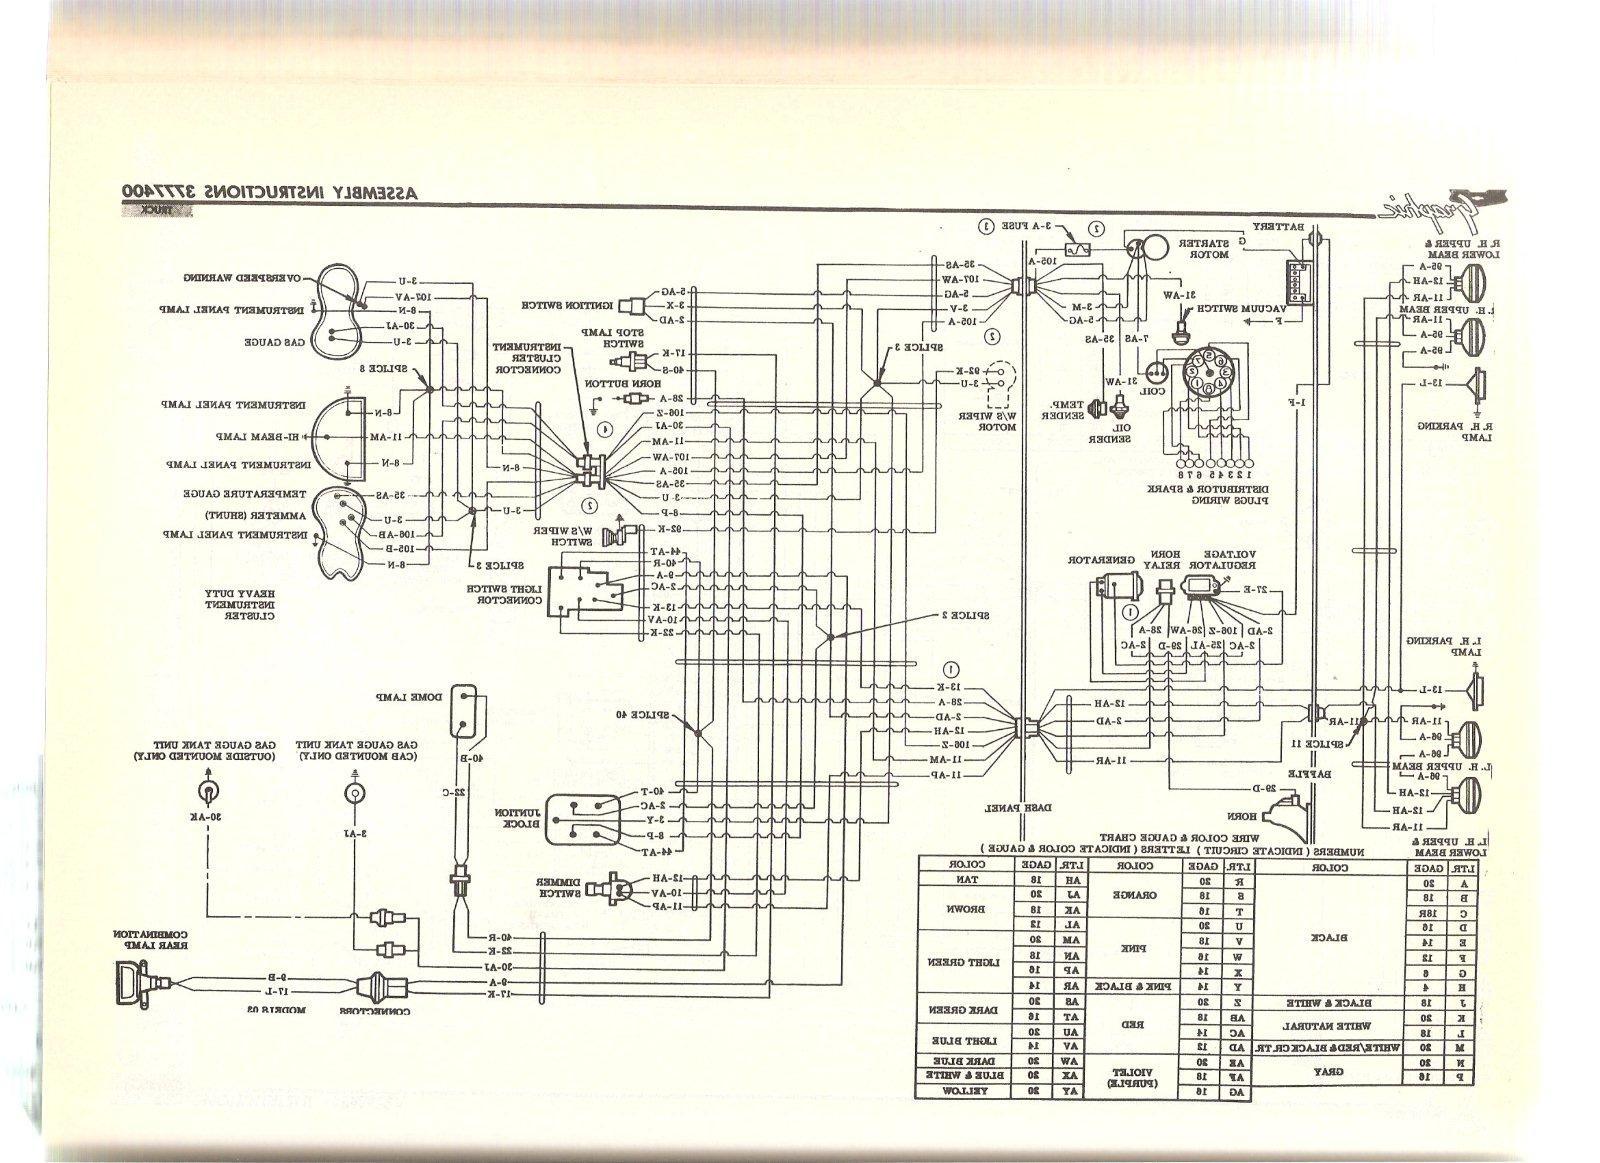 1963 impala headlight switch wiring diagram 4 way 2 for 1961 chevy c10 apache get free